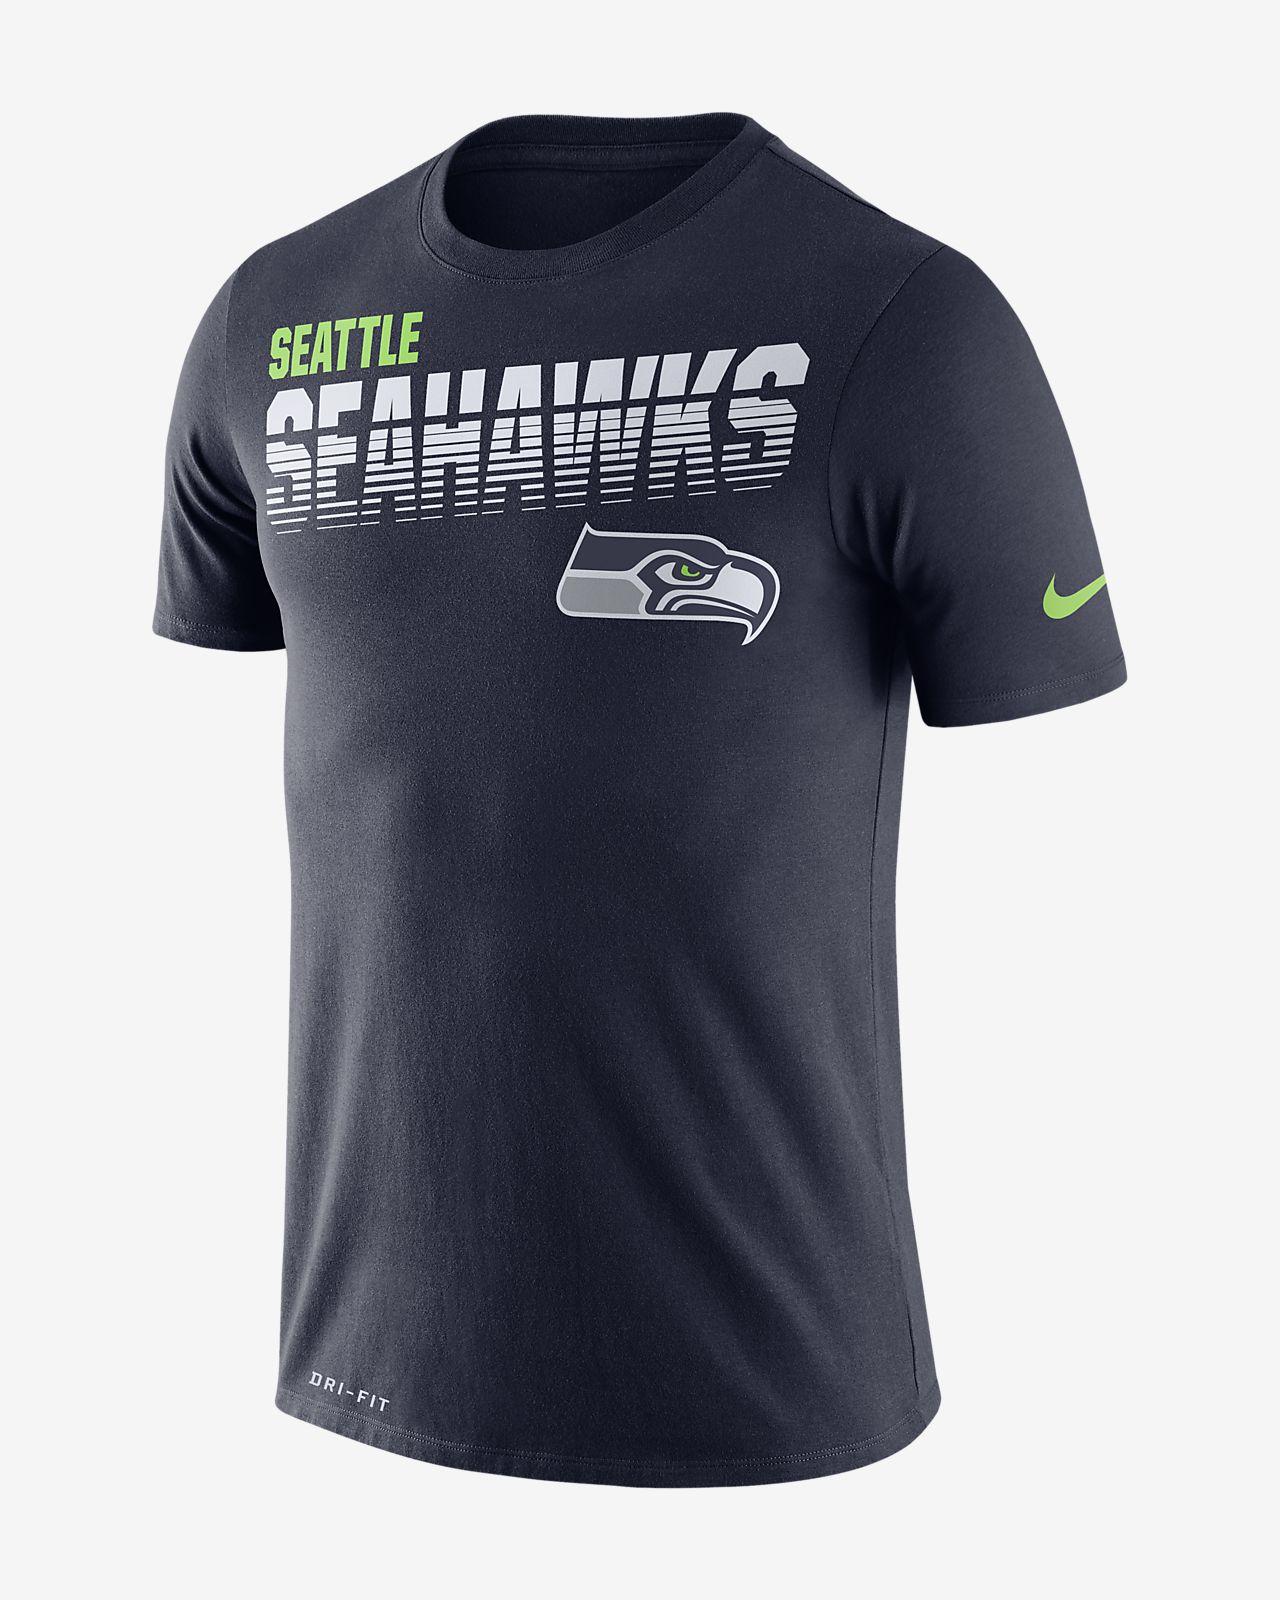 Kortärmad t-shirt Nike Legend (NFL Seahawks) för män